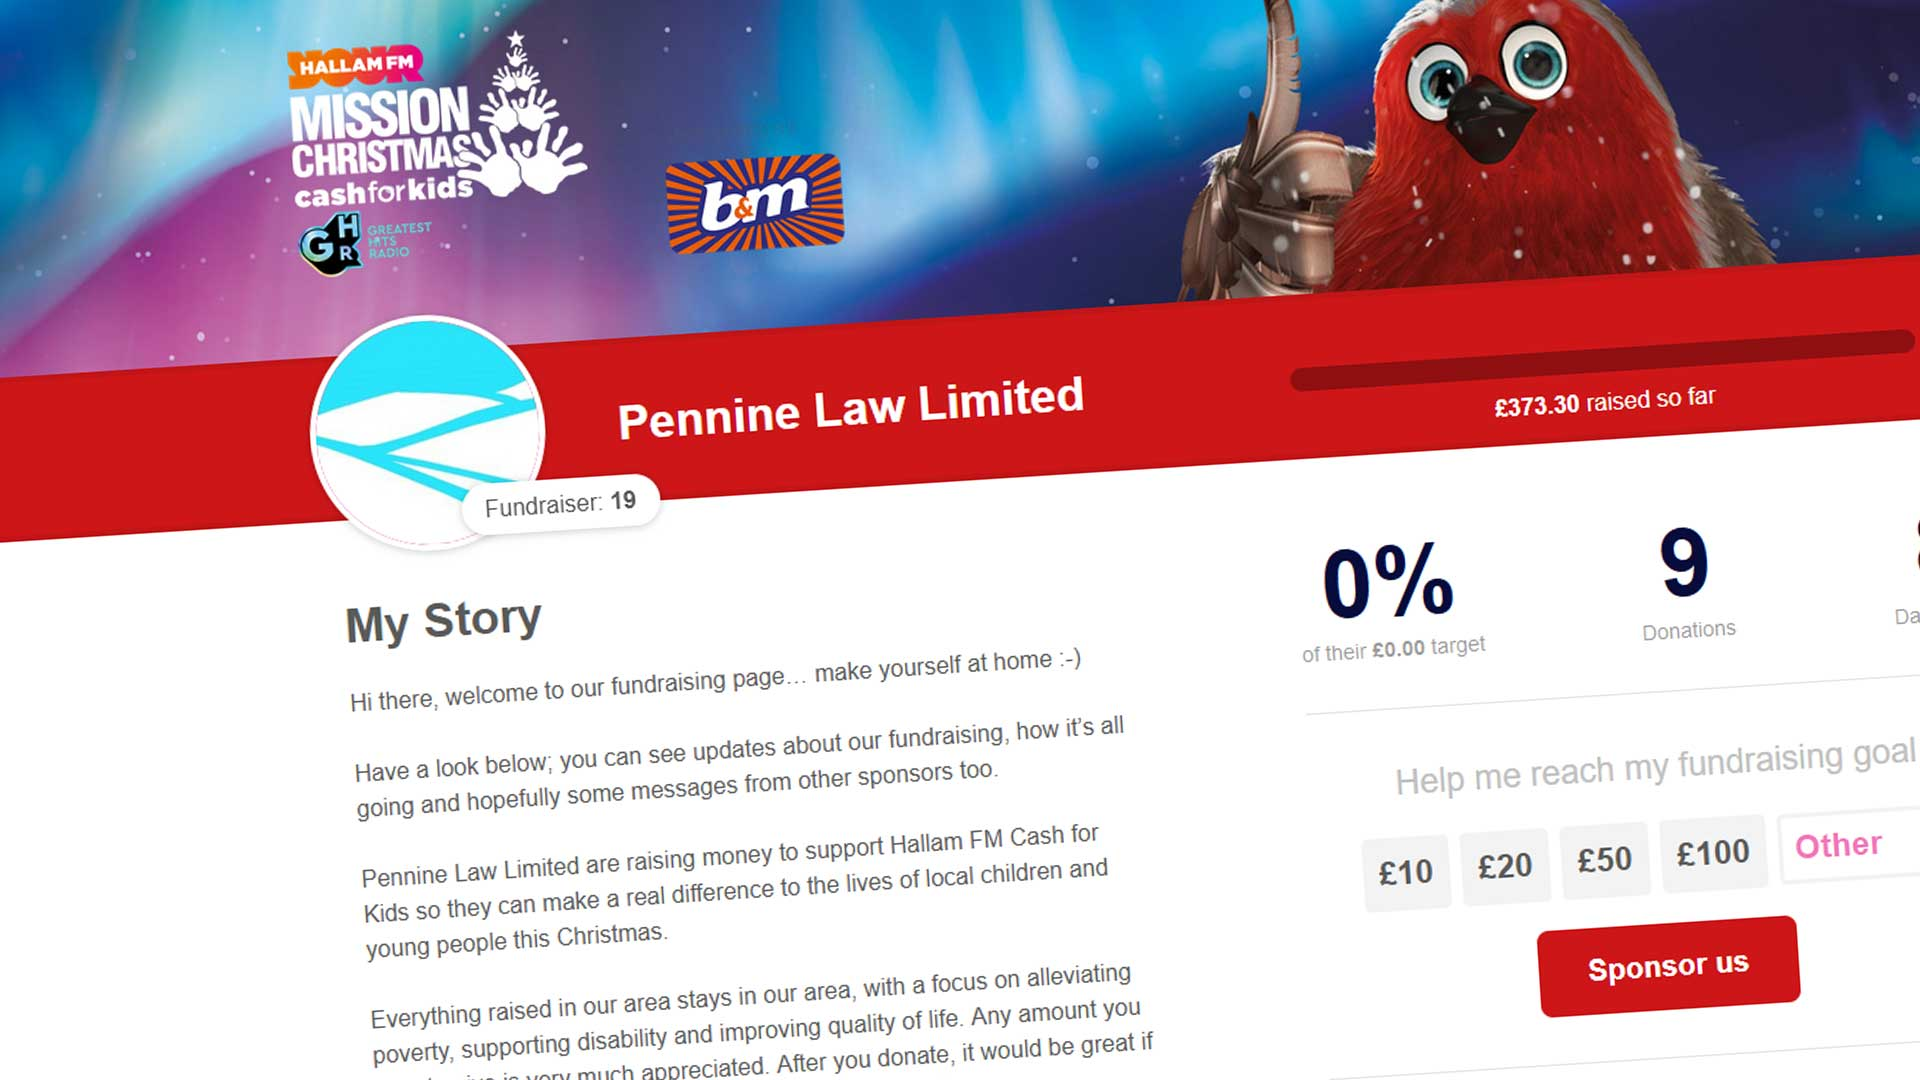 Pennine Law - Cash for Kids Mission Christmas